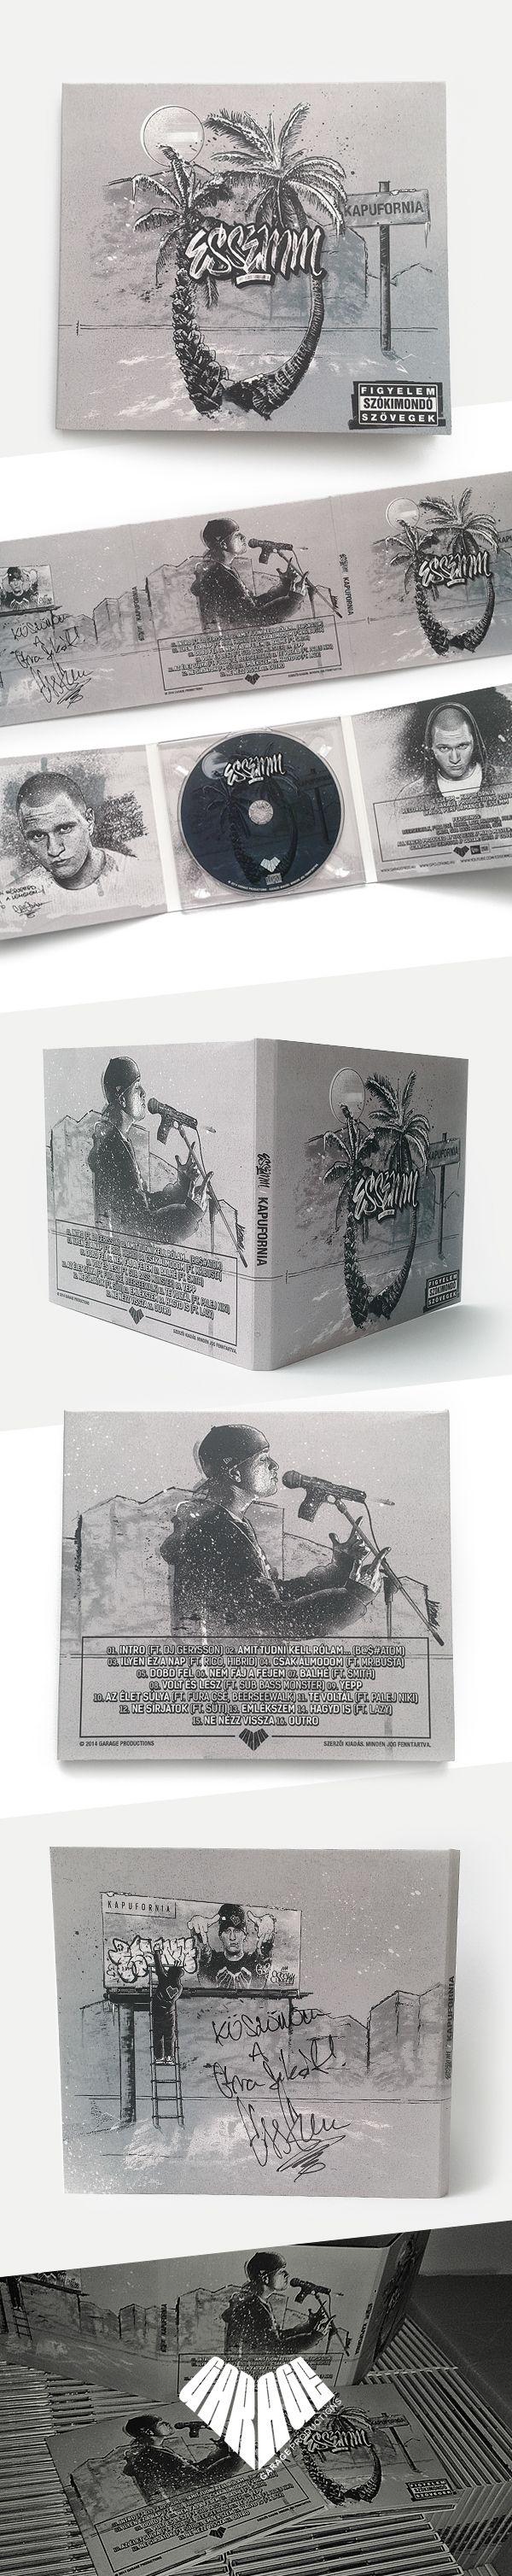 https://www.behance.net/gallery/20089195/ESSEMM-KAPUFORNIA-LP-cover?utm_medium=email